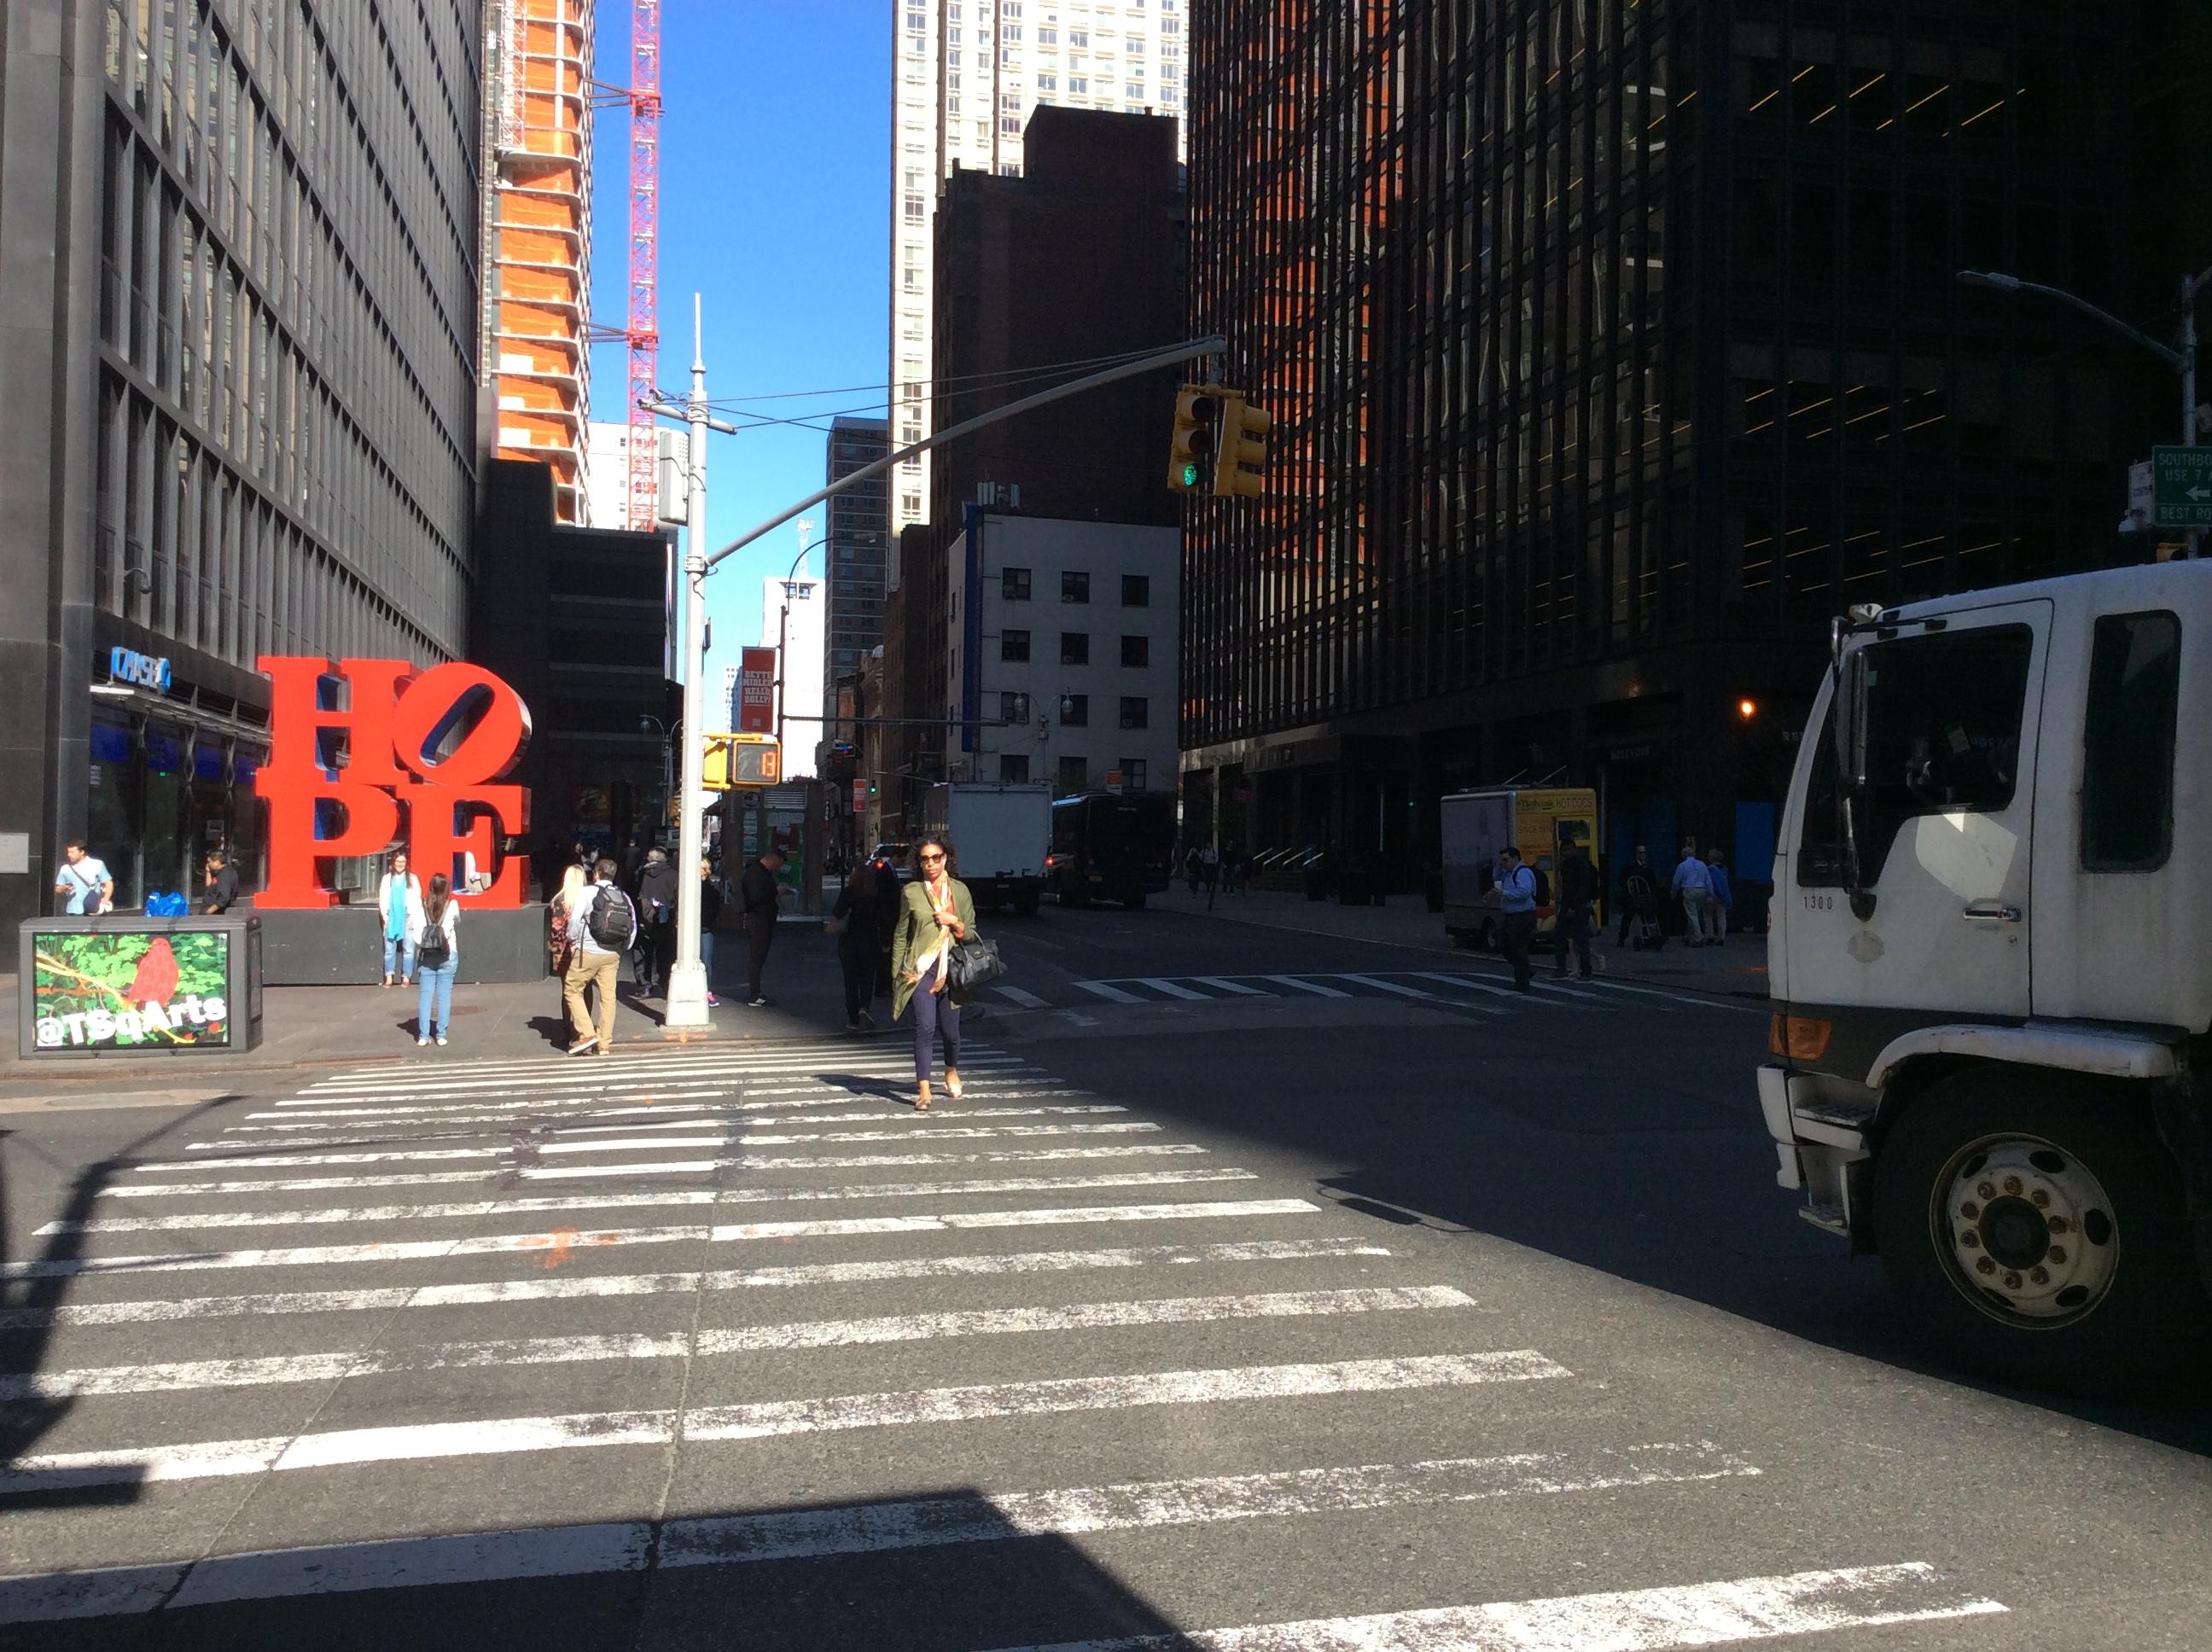 Robert Indiana, Hope, Manhattan, 2017. Foto met dank aan Epigenius, CC BY-SA 4.0